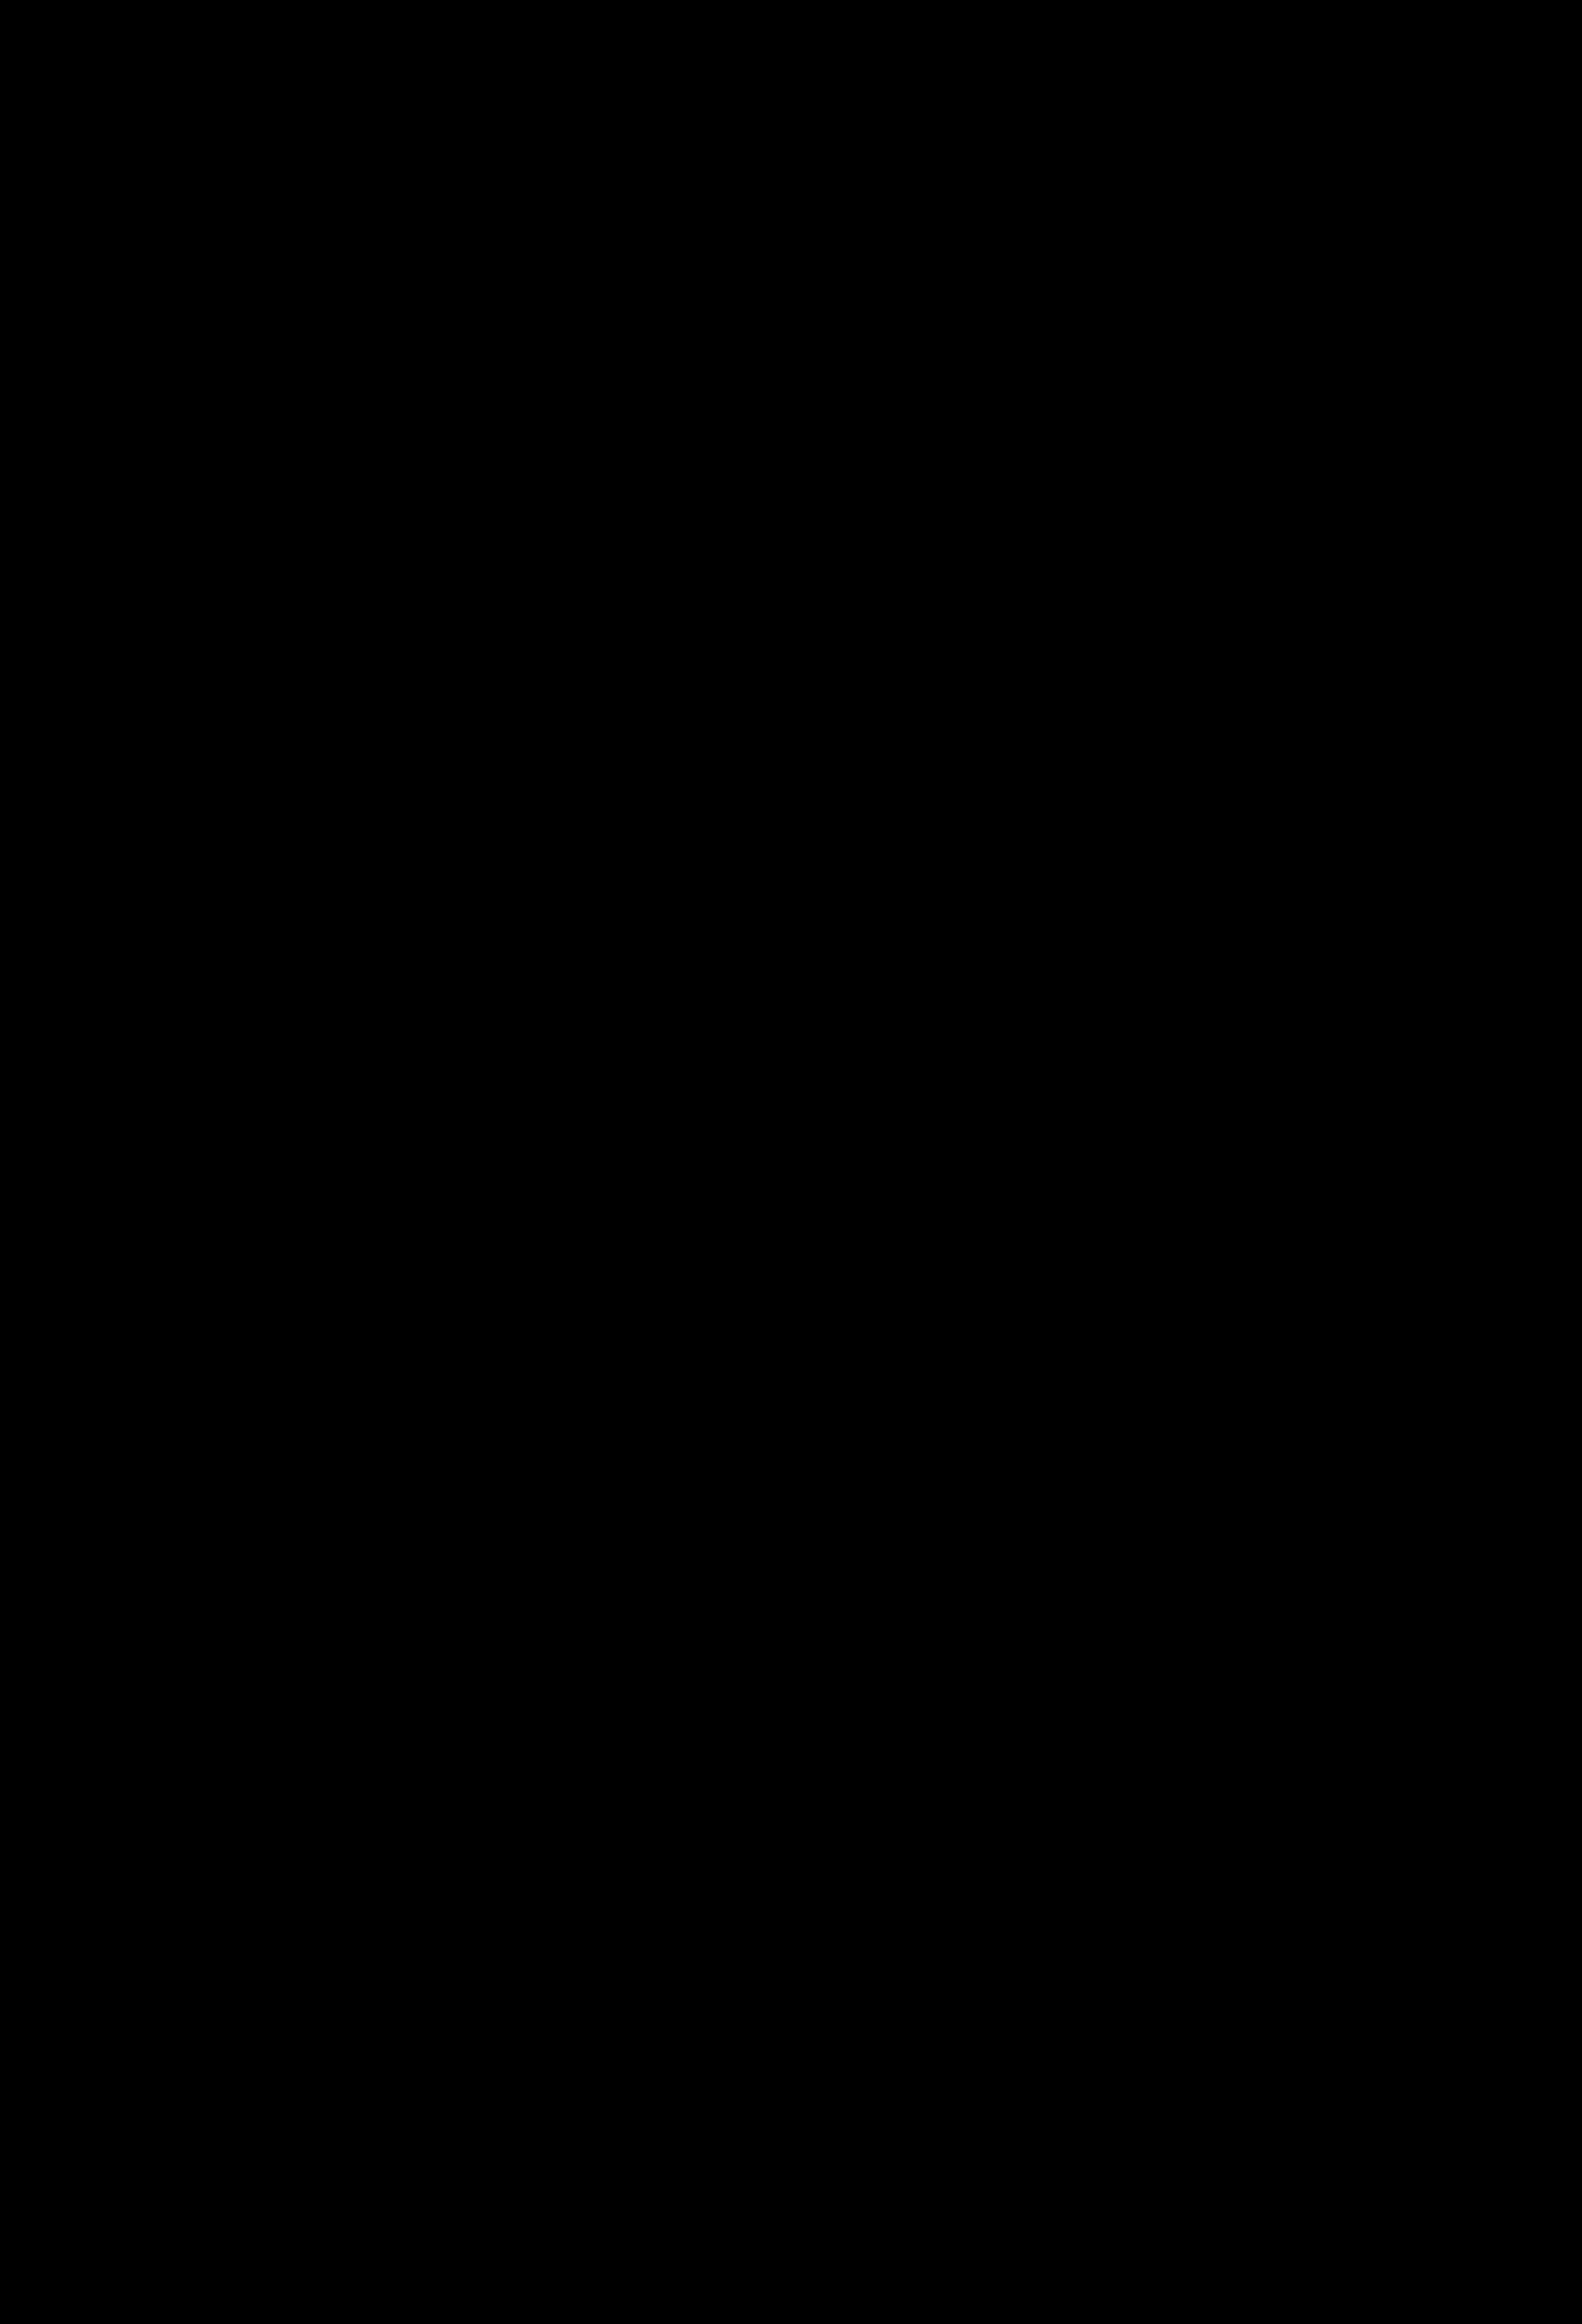 Hamono - strona kategorii